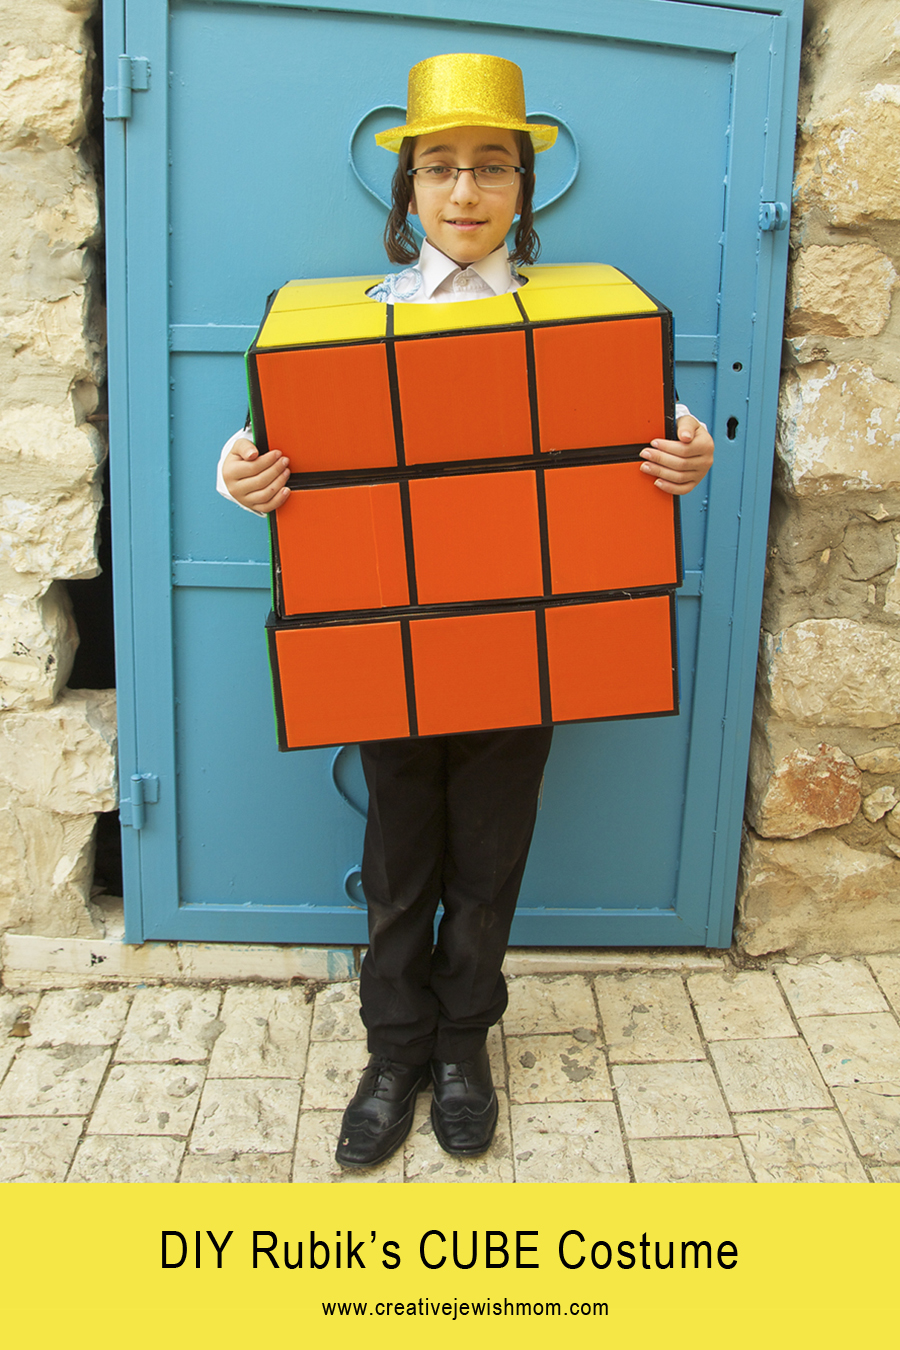 Creative jewish mom costumes rubiks cube costume diy for kids solutioingenieria Gallery